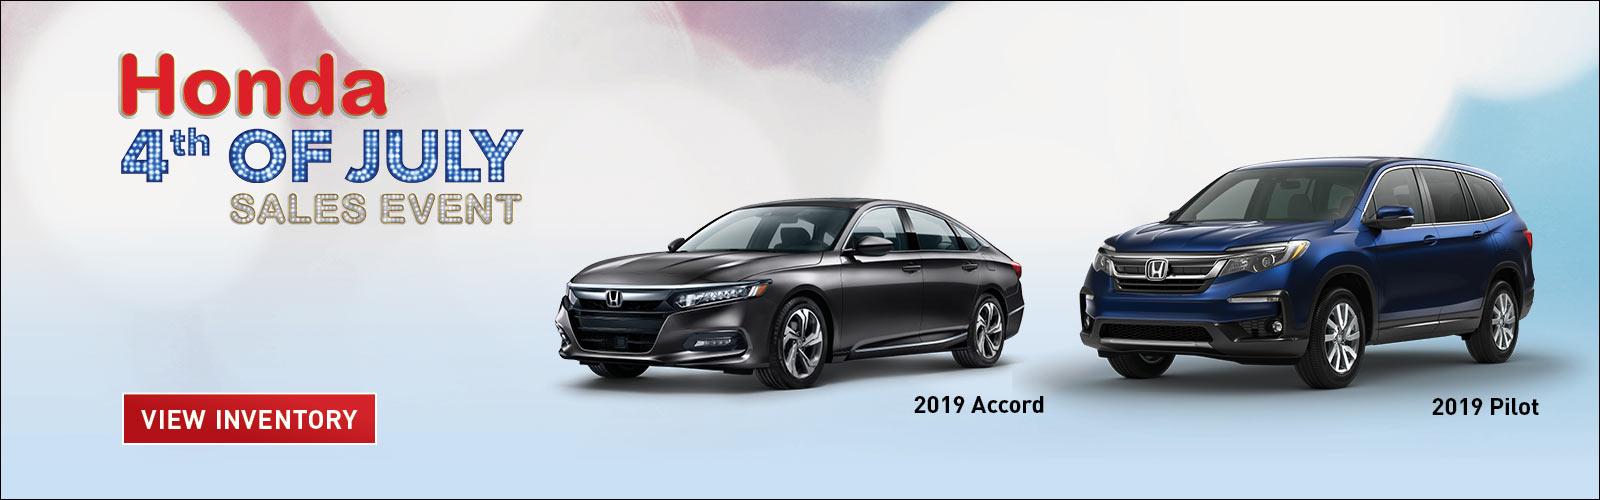 2018 2019 Honda New Used Car Dealer Houston Woodlands Tomball